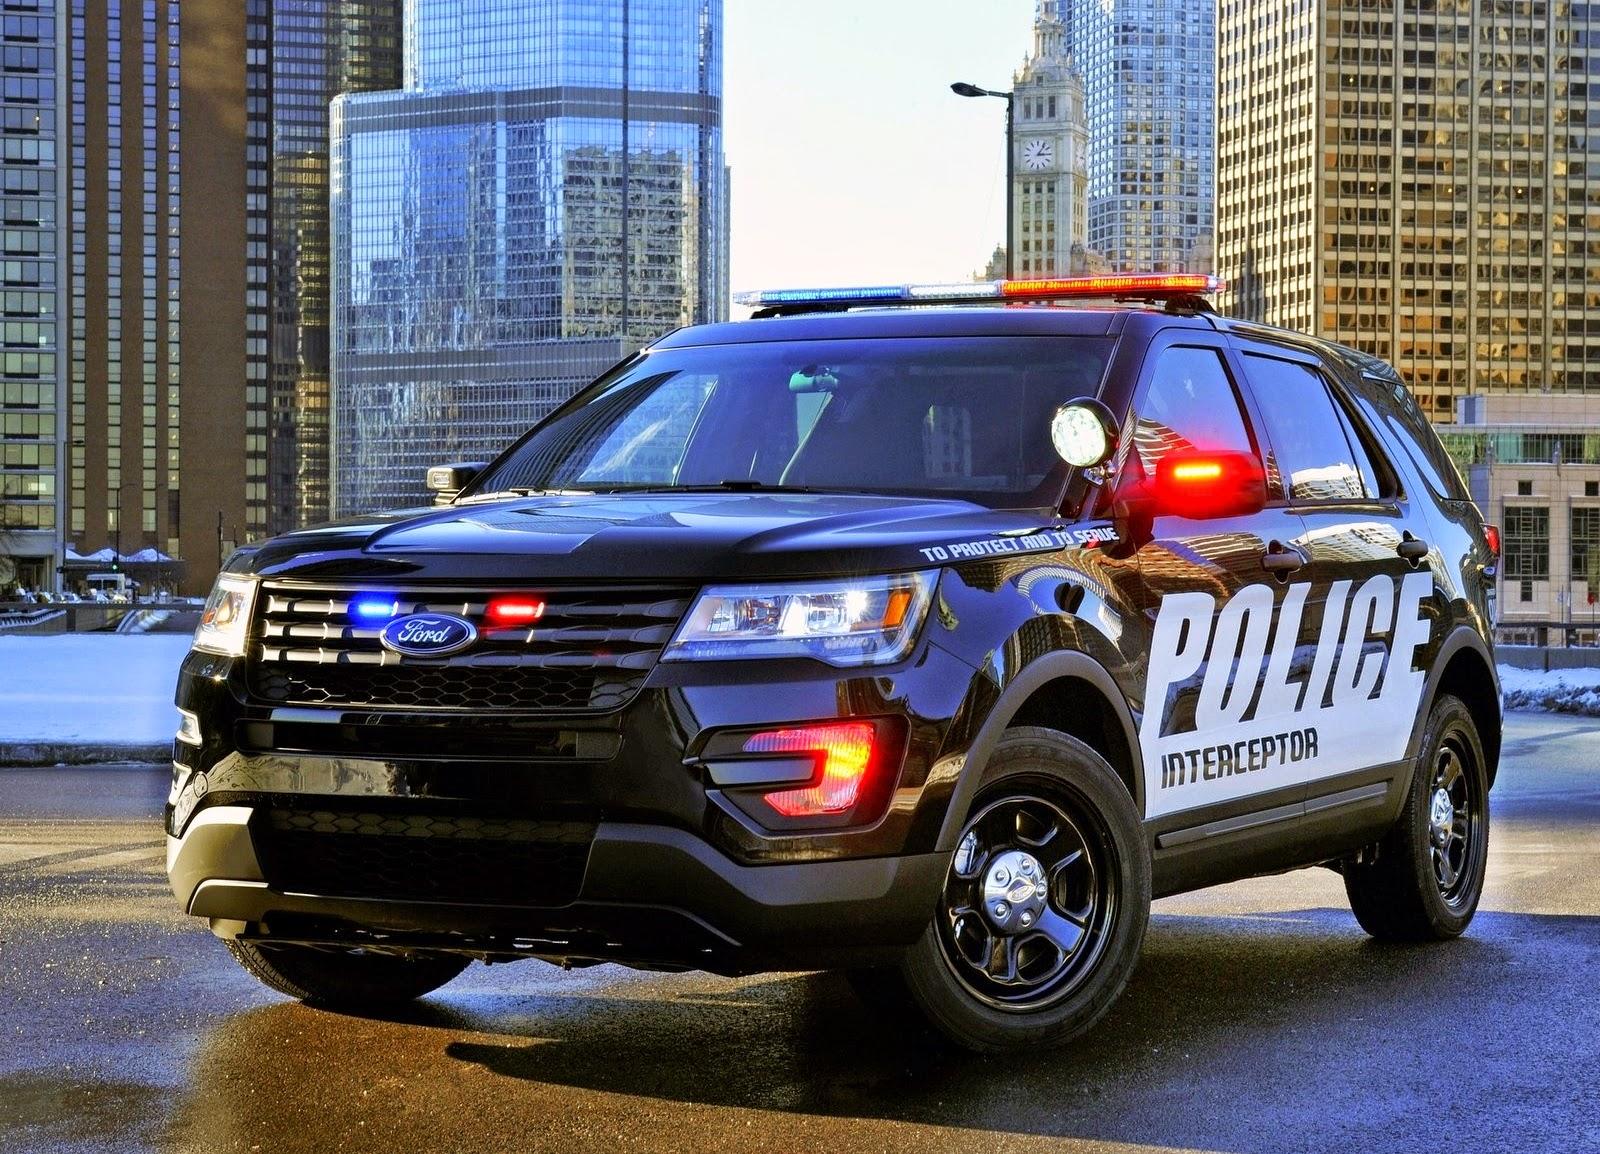 Ford Police Interceptor Utility Hd Car Wallpaper  Classic